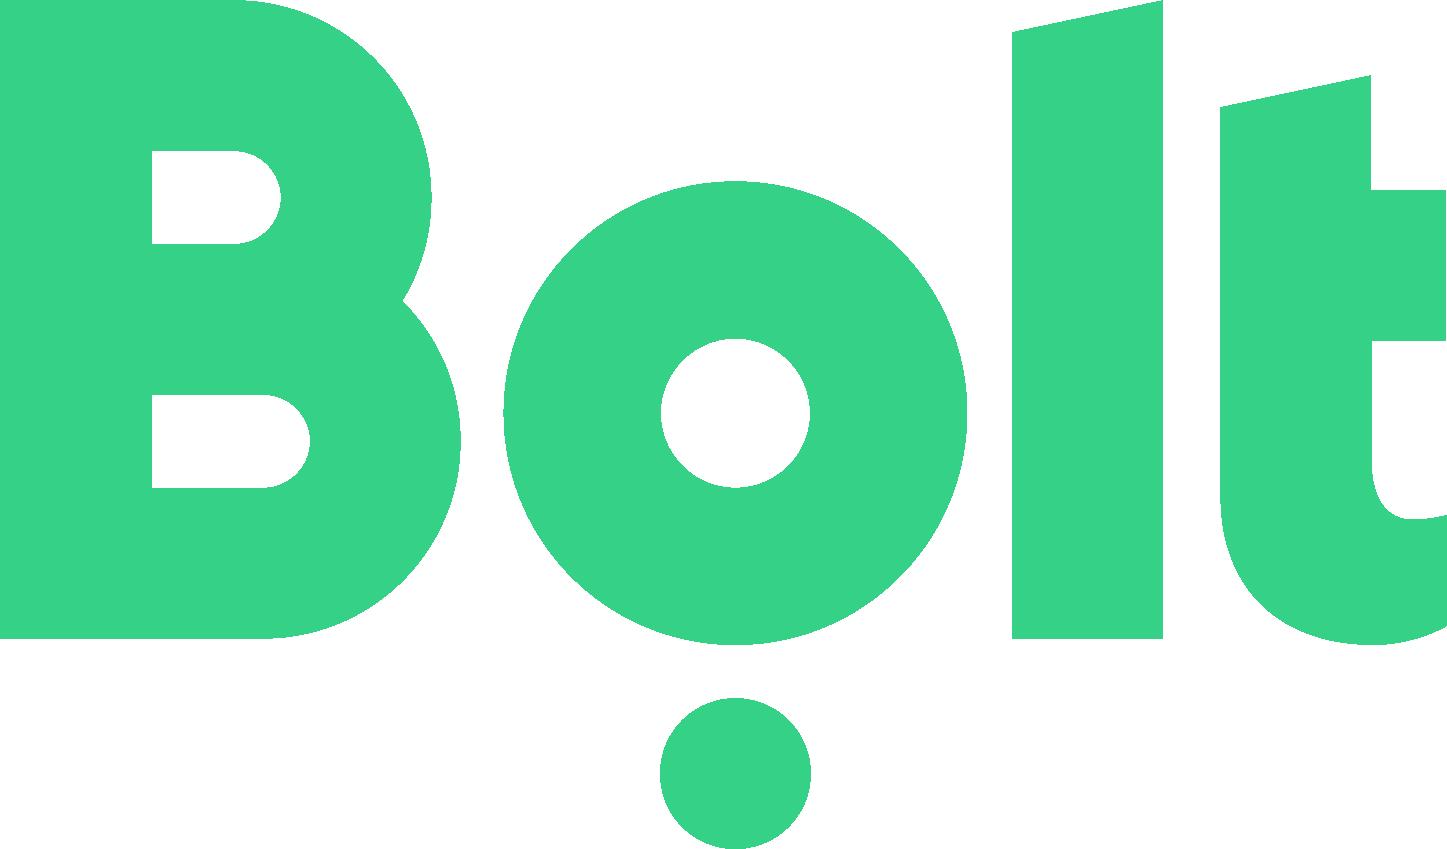 Bolt_logo